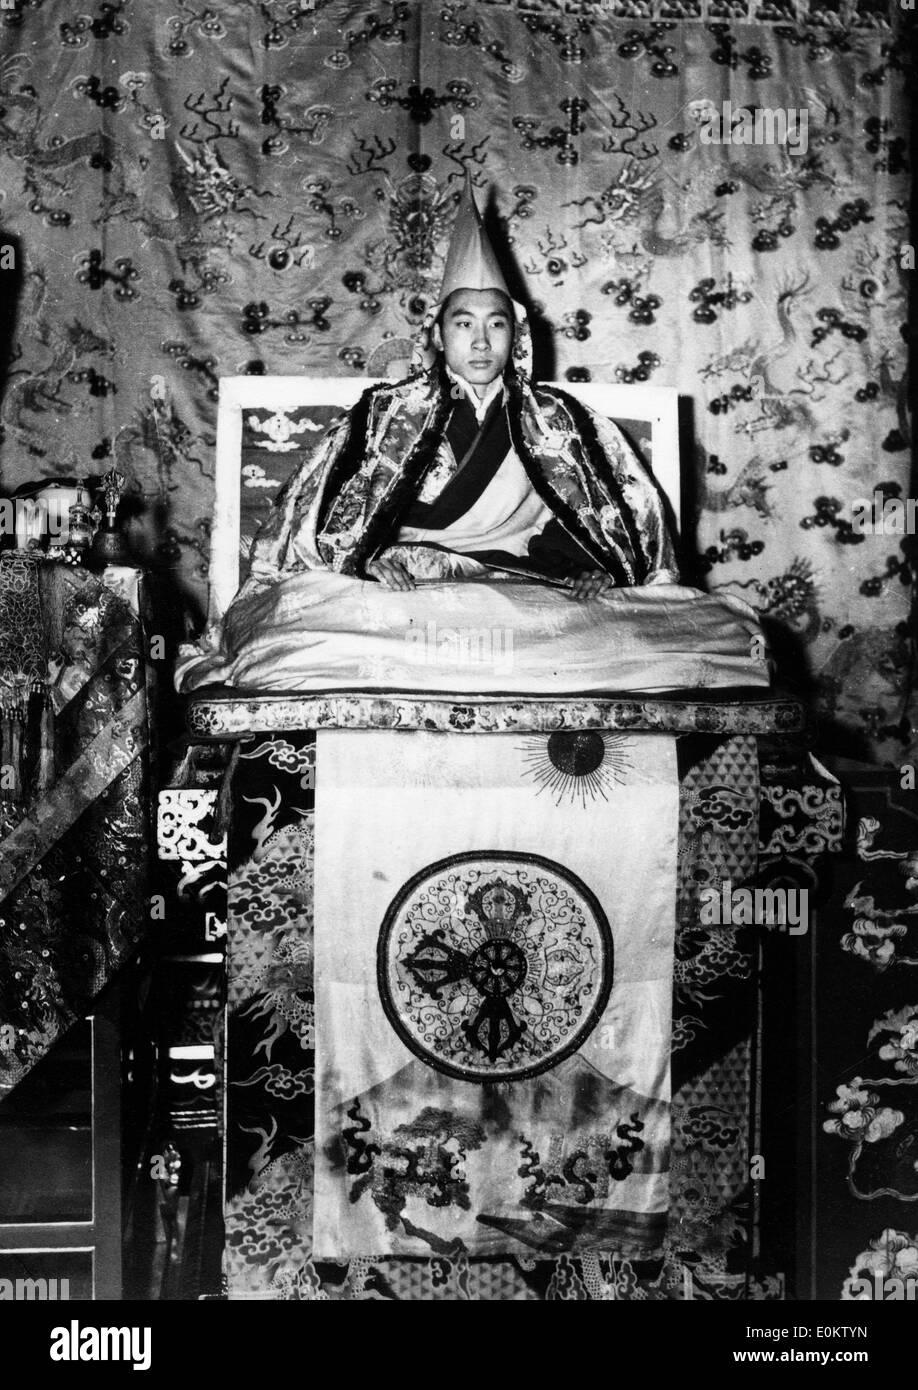 The 14th Dalai Lama upon his throne in Tibet - Stock Image